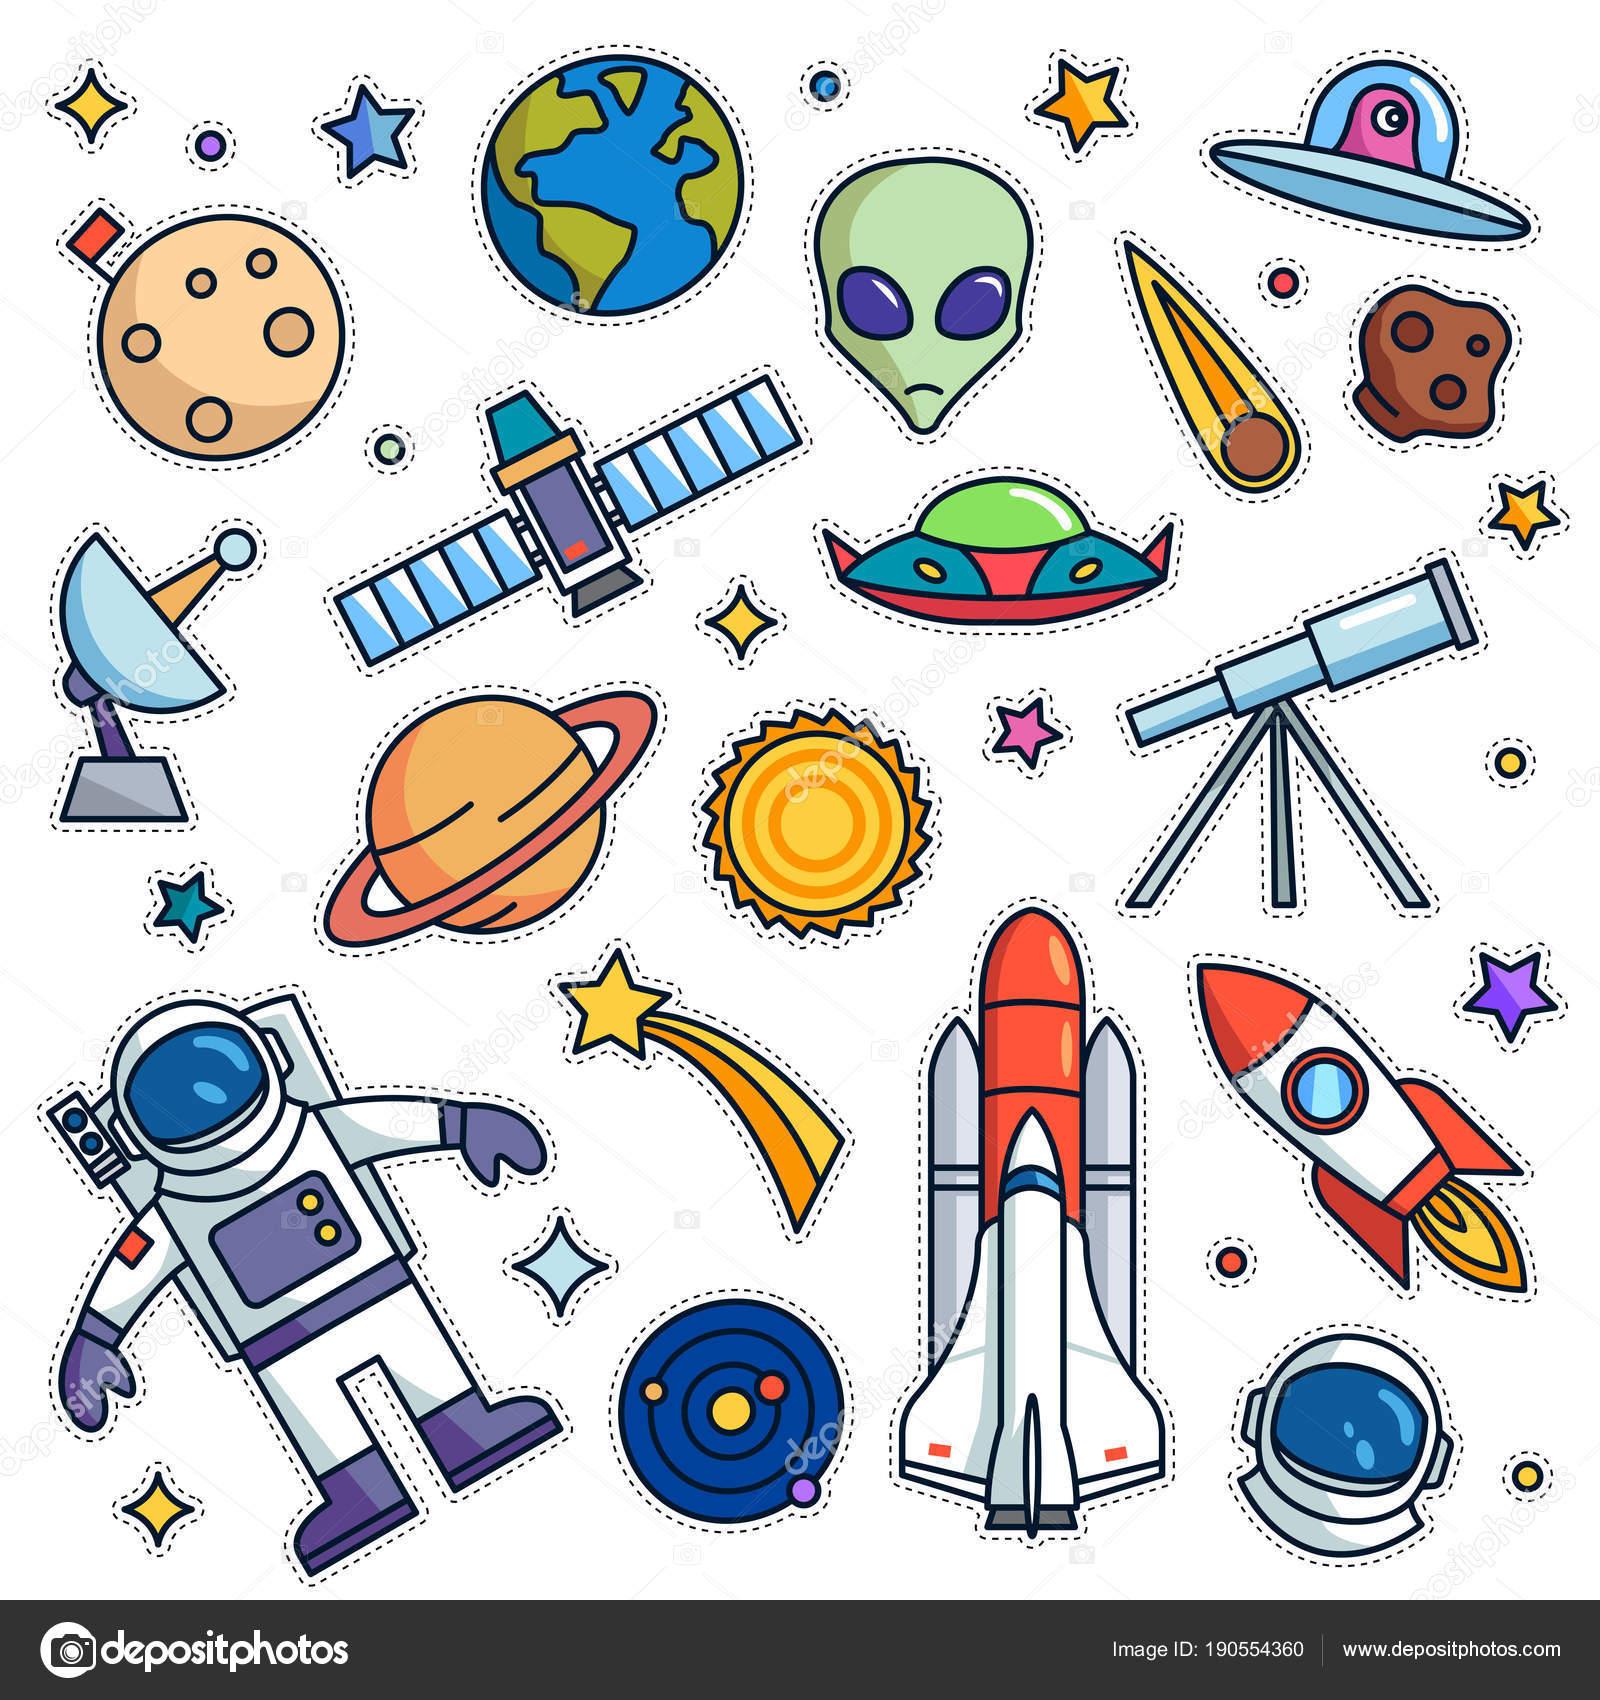 Vintage 80s 90s Space Theme Fashion Cartoon Illustration Set